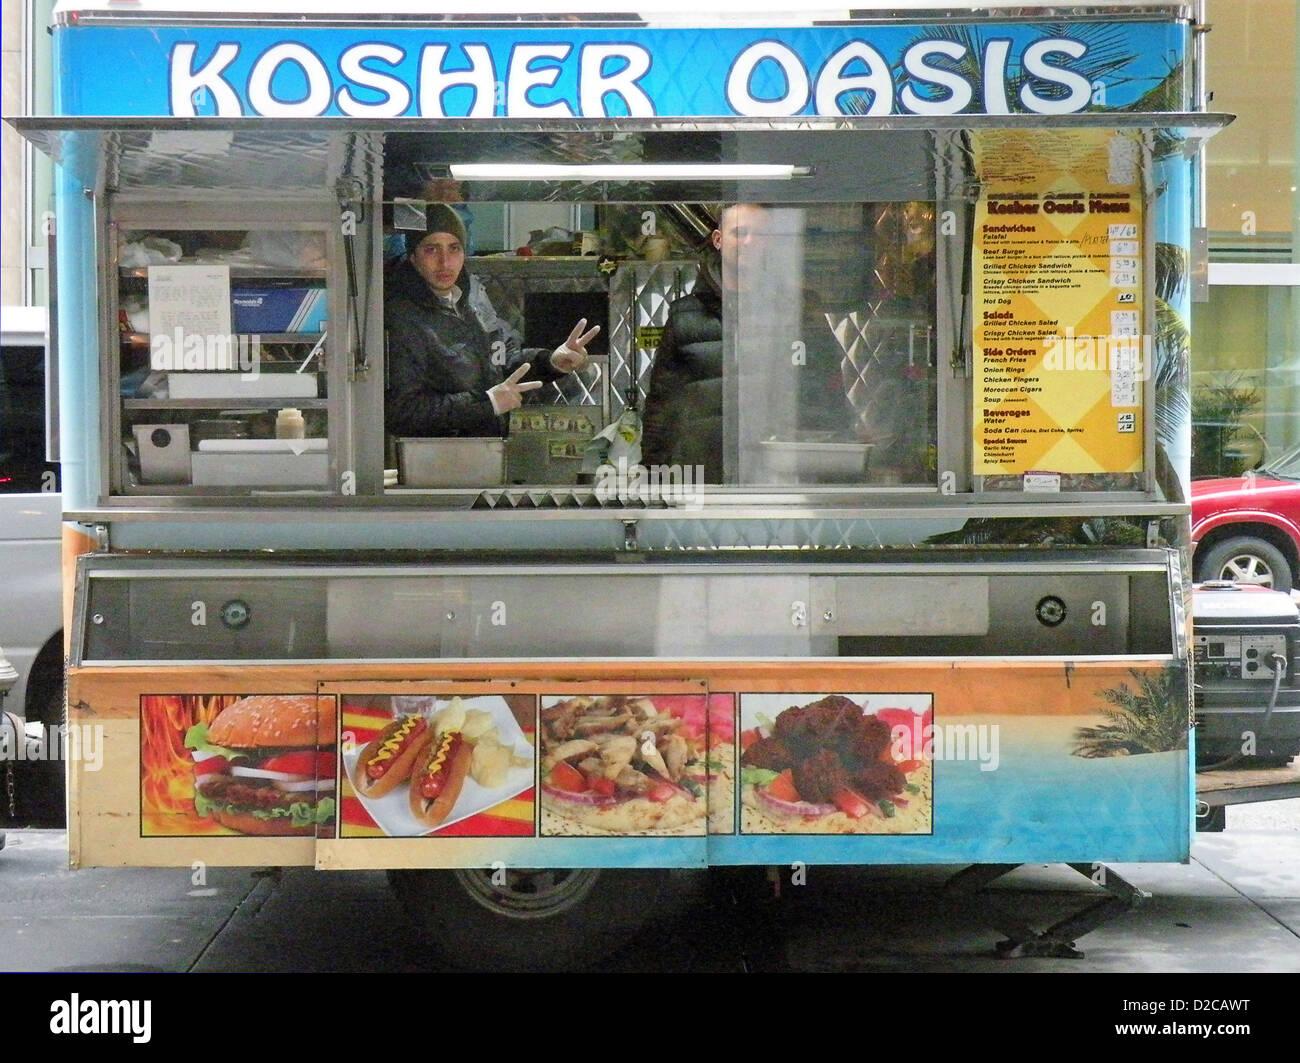 Kosher Food Truck In Orlando